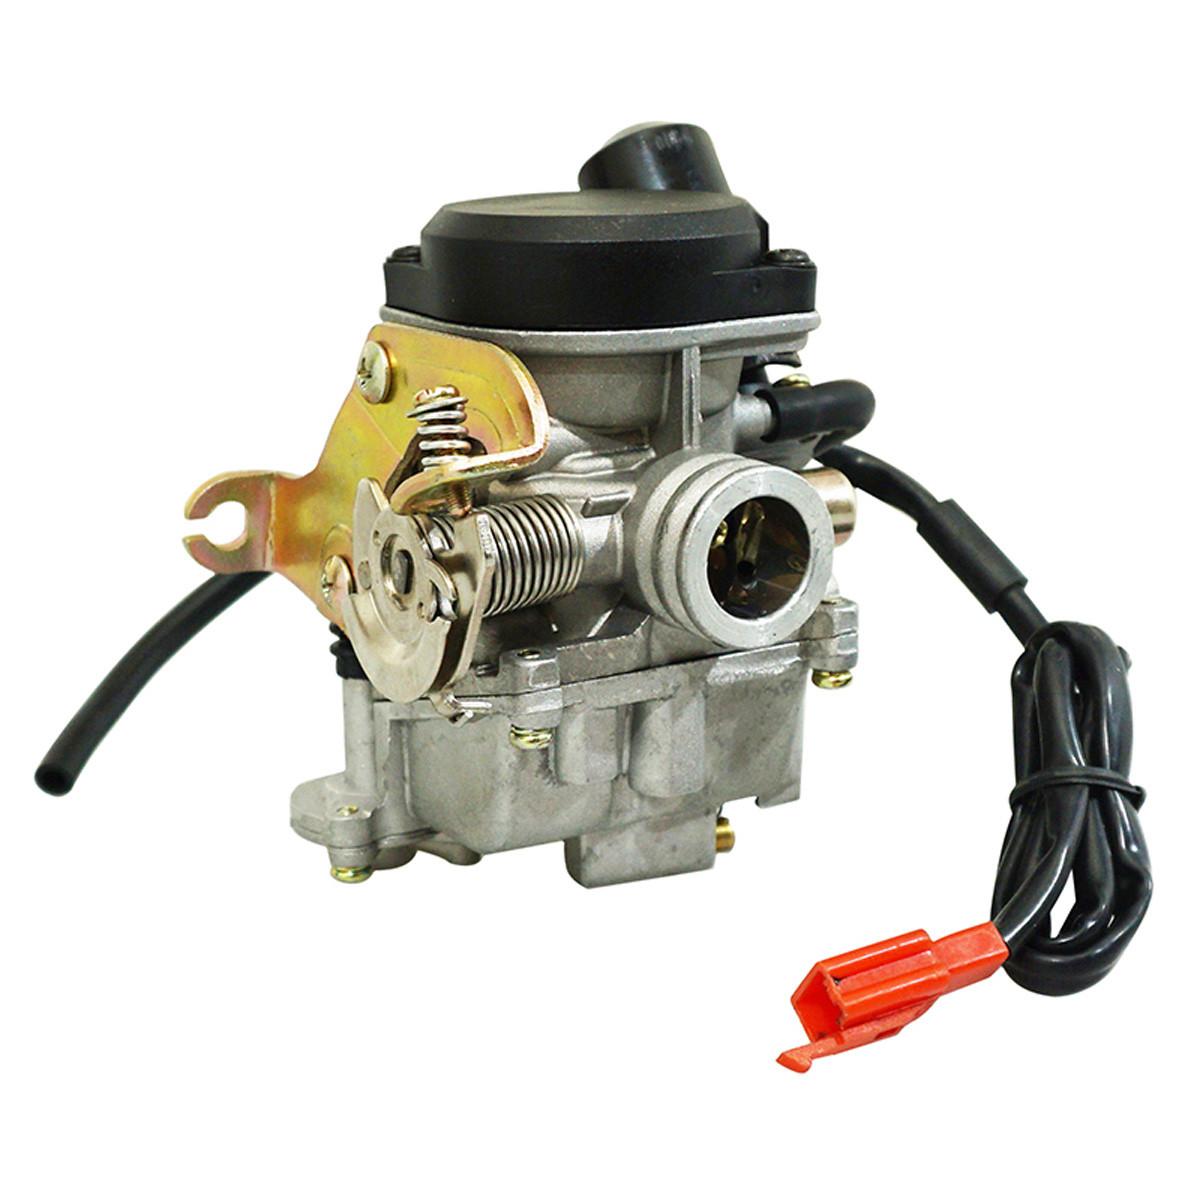 Carburateur Peugeot Kymco SYM 139QM GY6 4T - 20mm